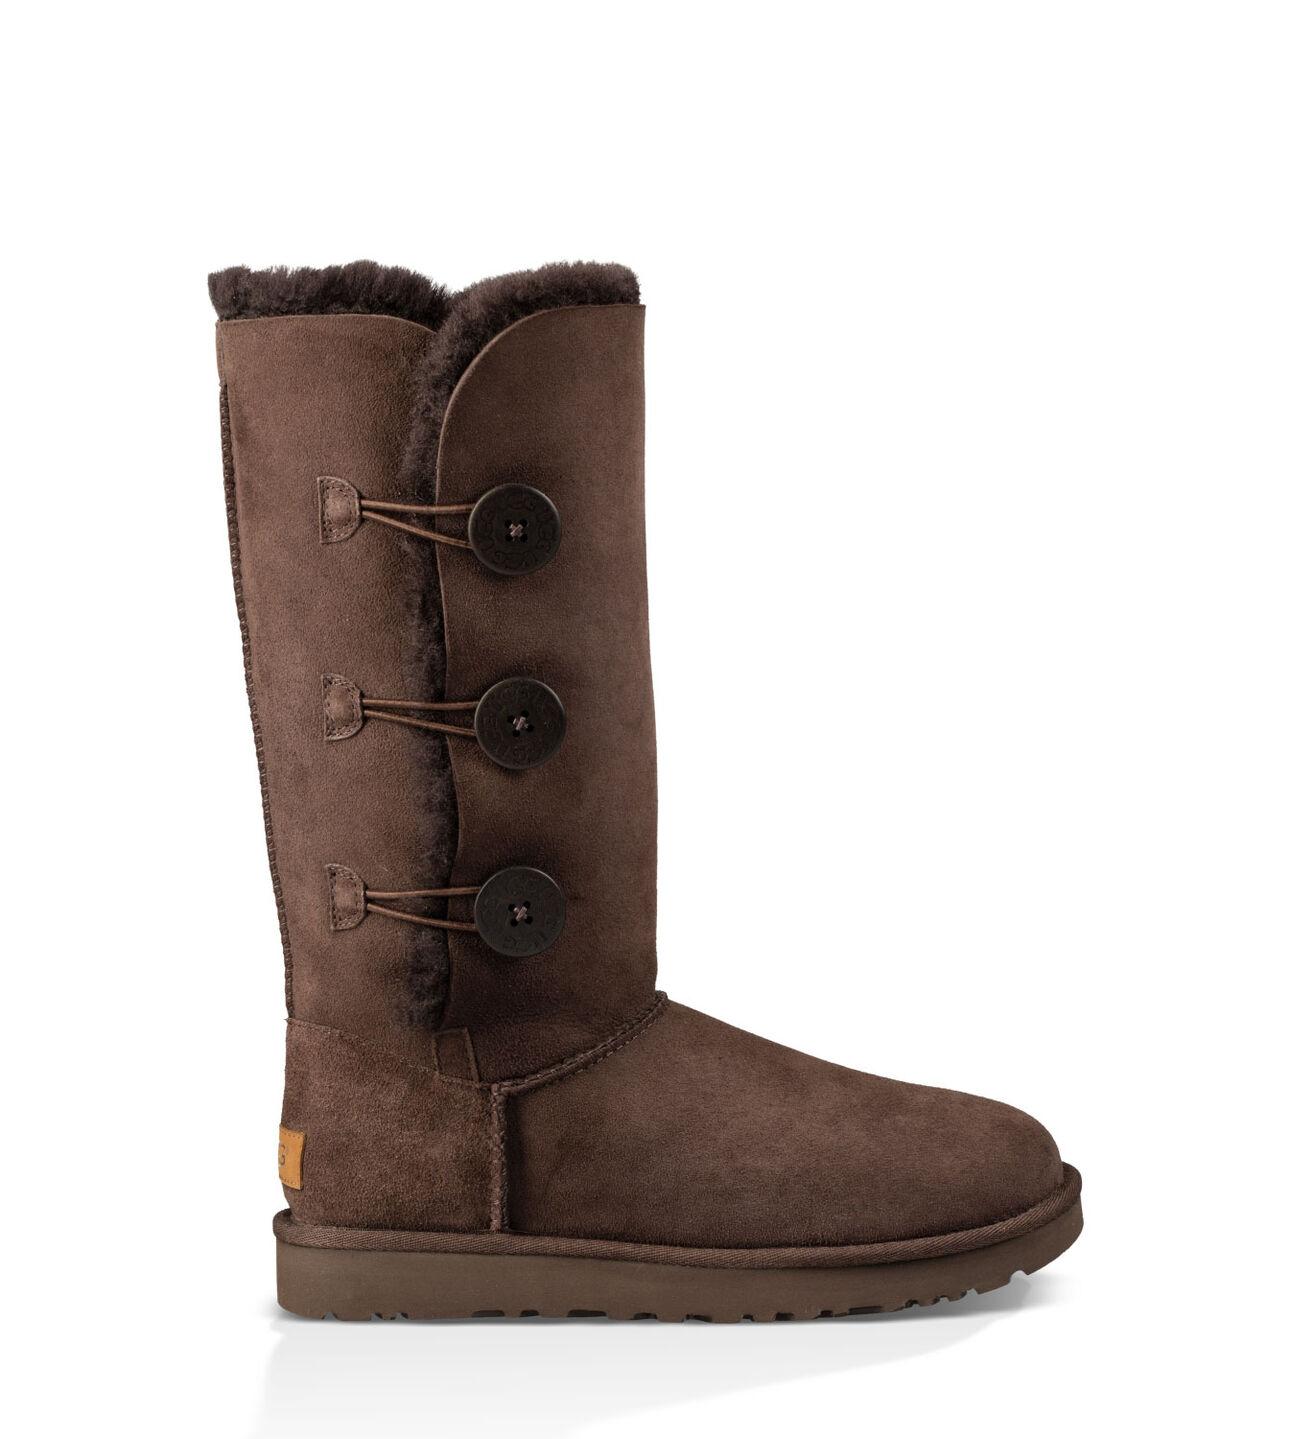 Ugg Boots 70 3 Button | American Go Association